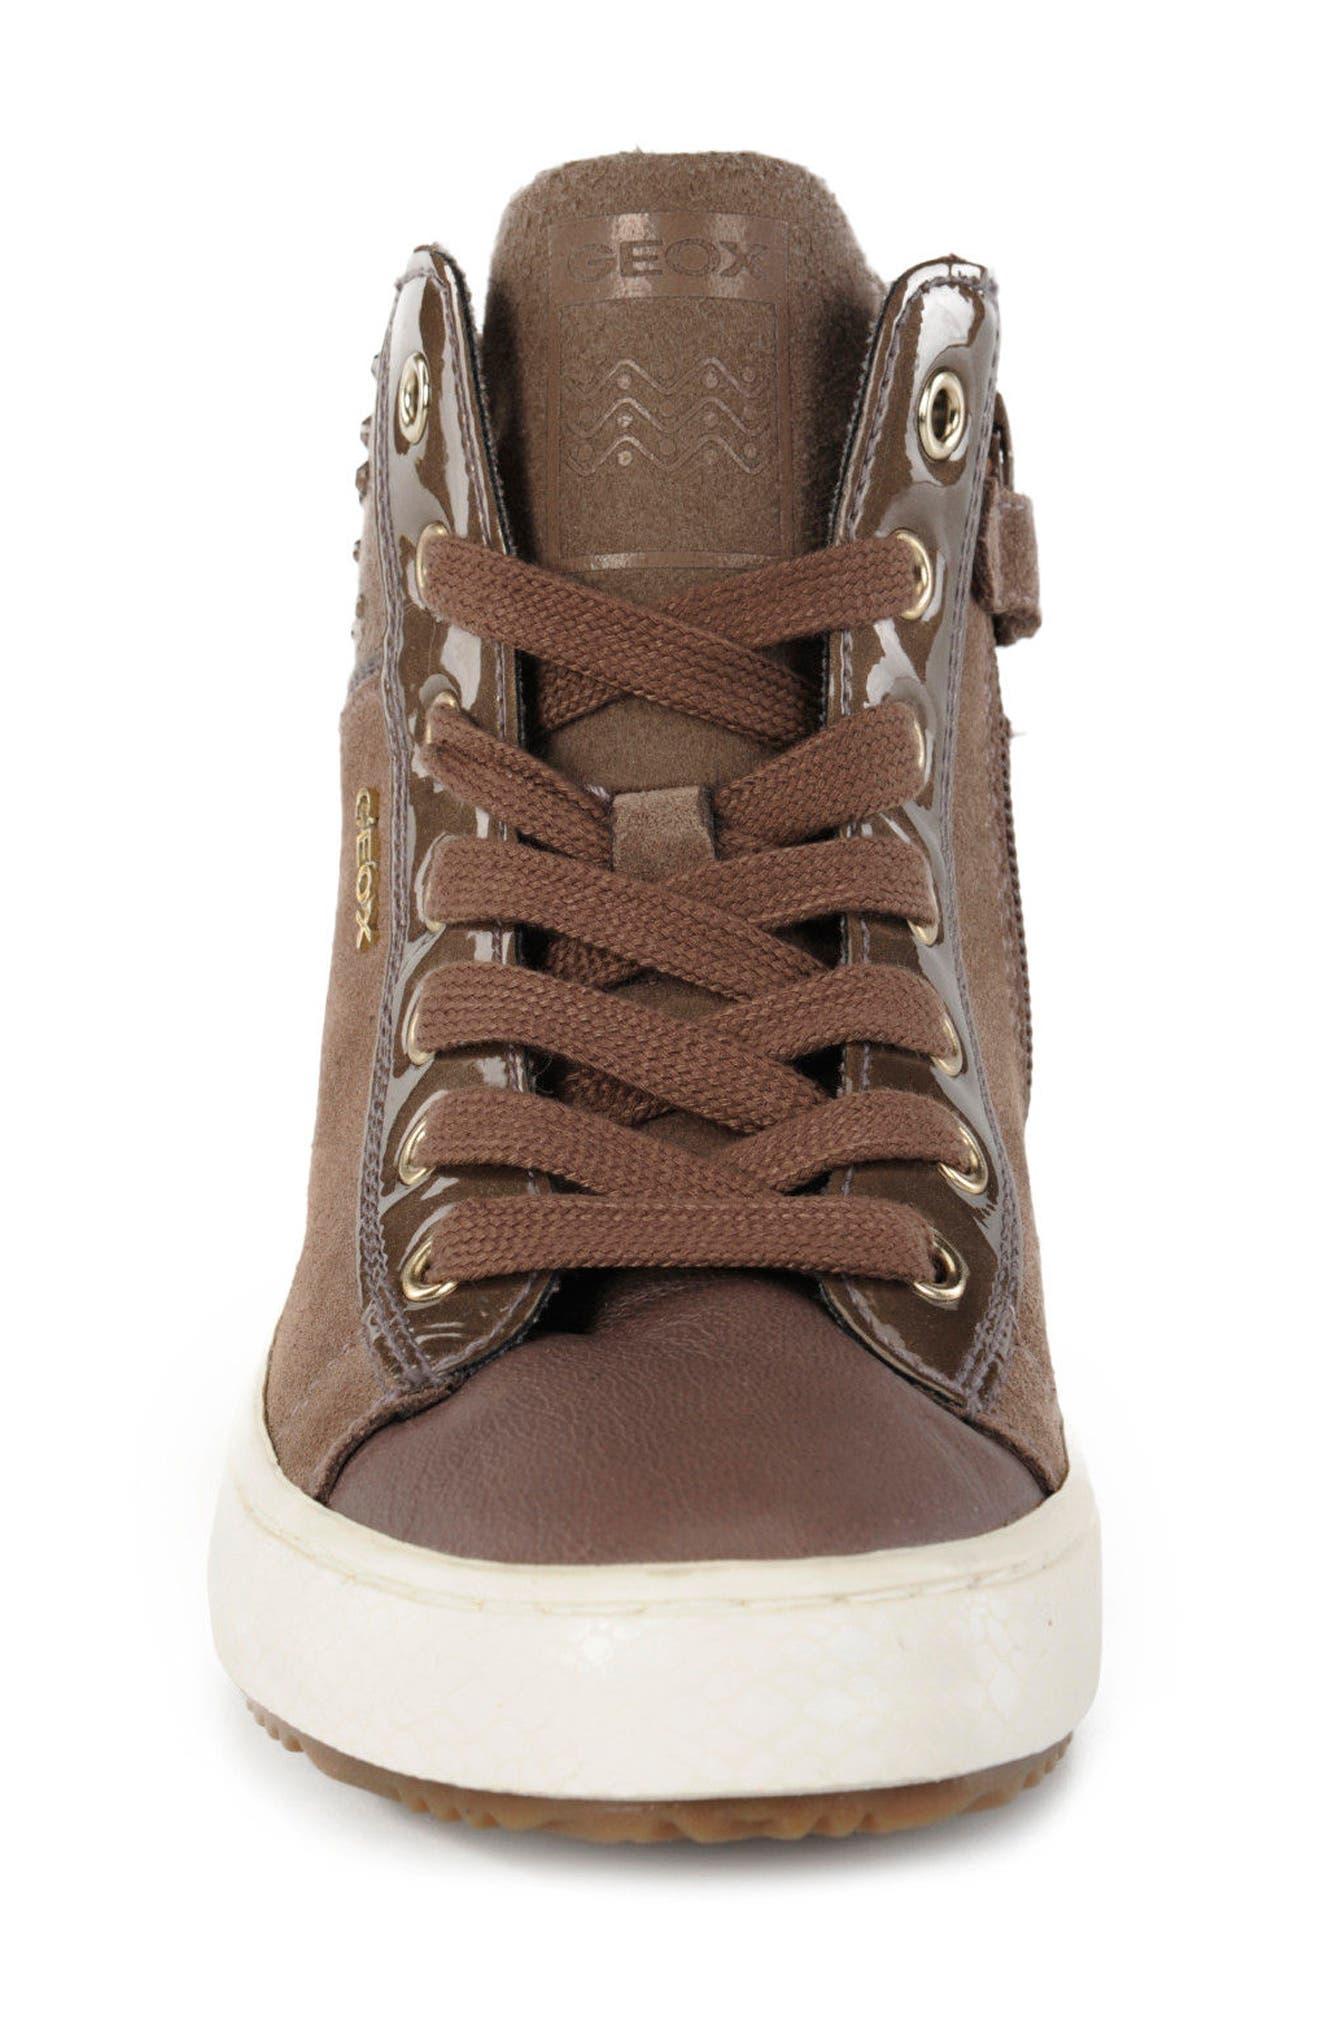 Kalispera Girl Embellished High Top Sneaker,                             Alternate thumbnail 5, color,                             Dark Beige